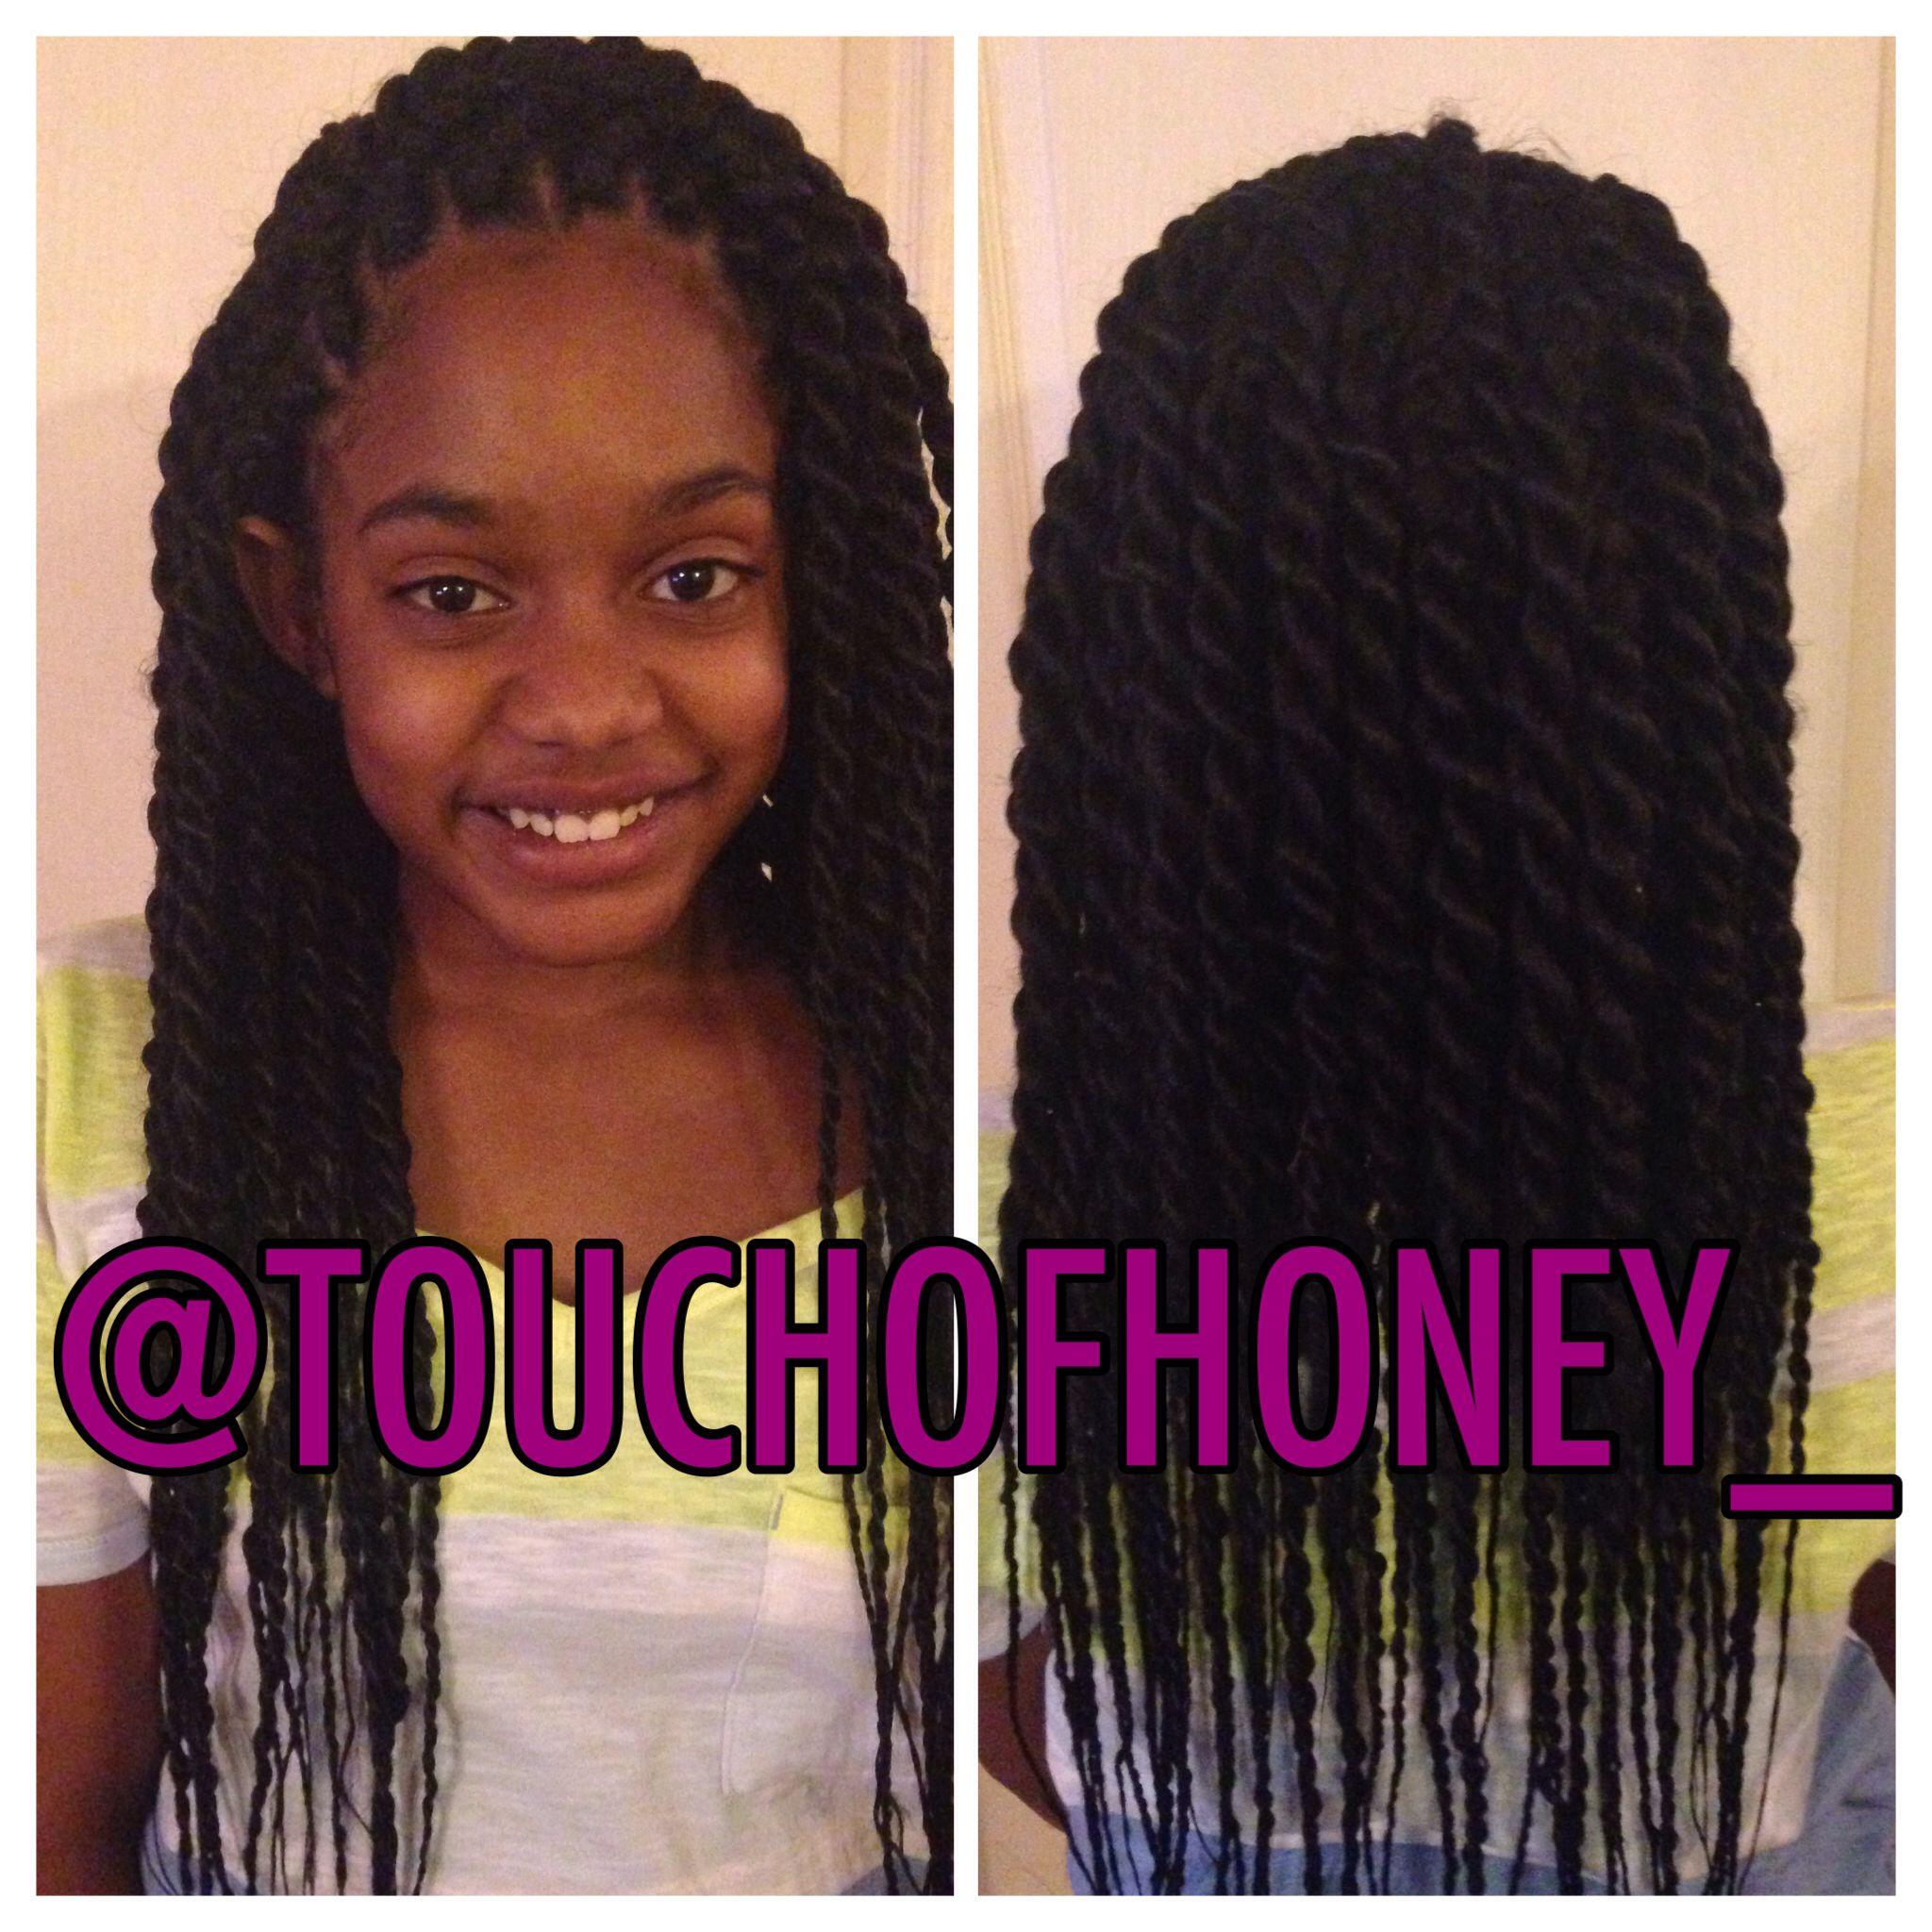 Jumbo senegalese twists follow my instagram hair page